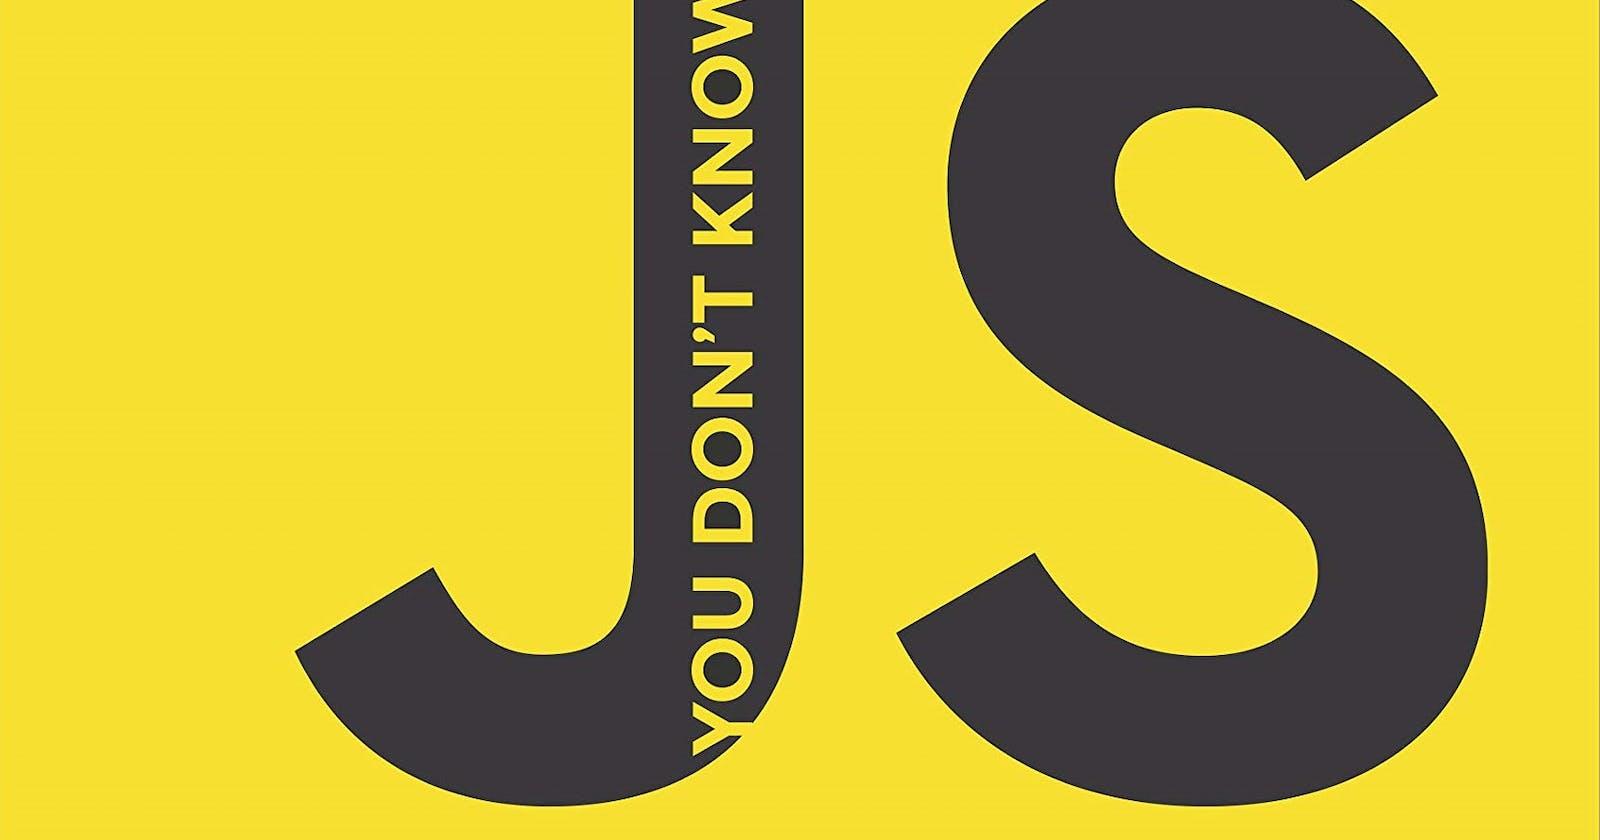 YDKJS - UP & GOING, Takeaways for Experienced JavaScript Developer